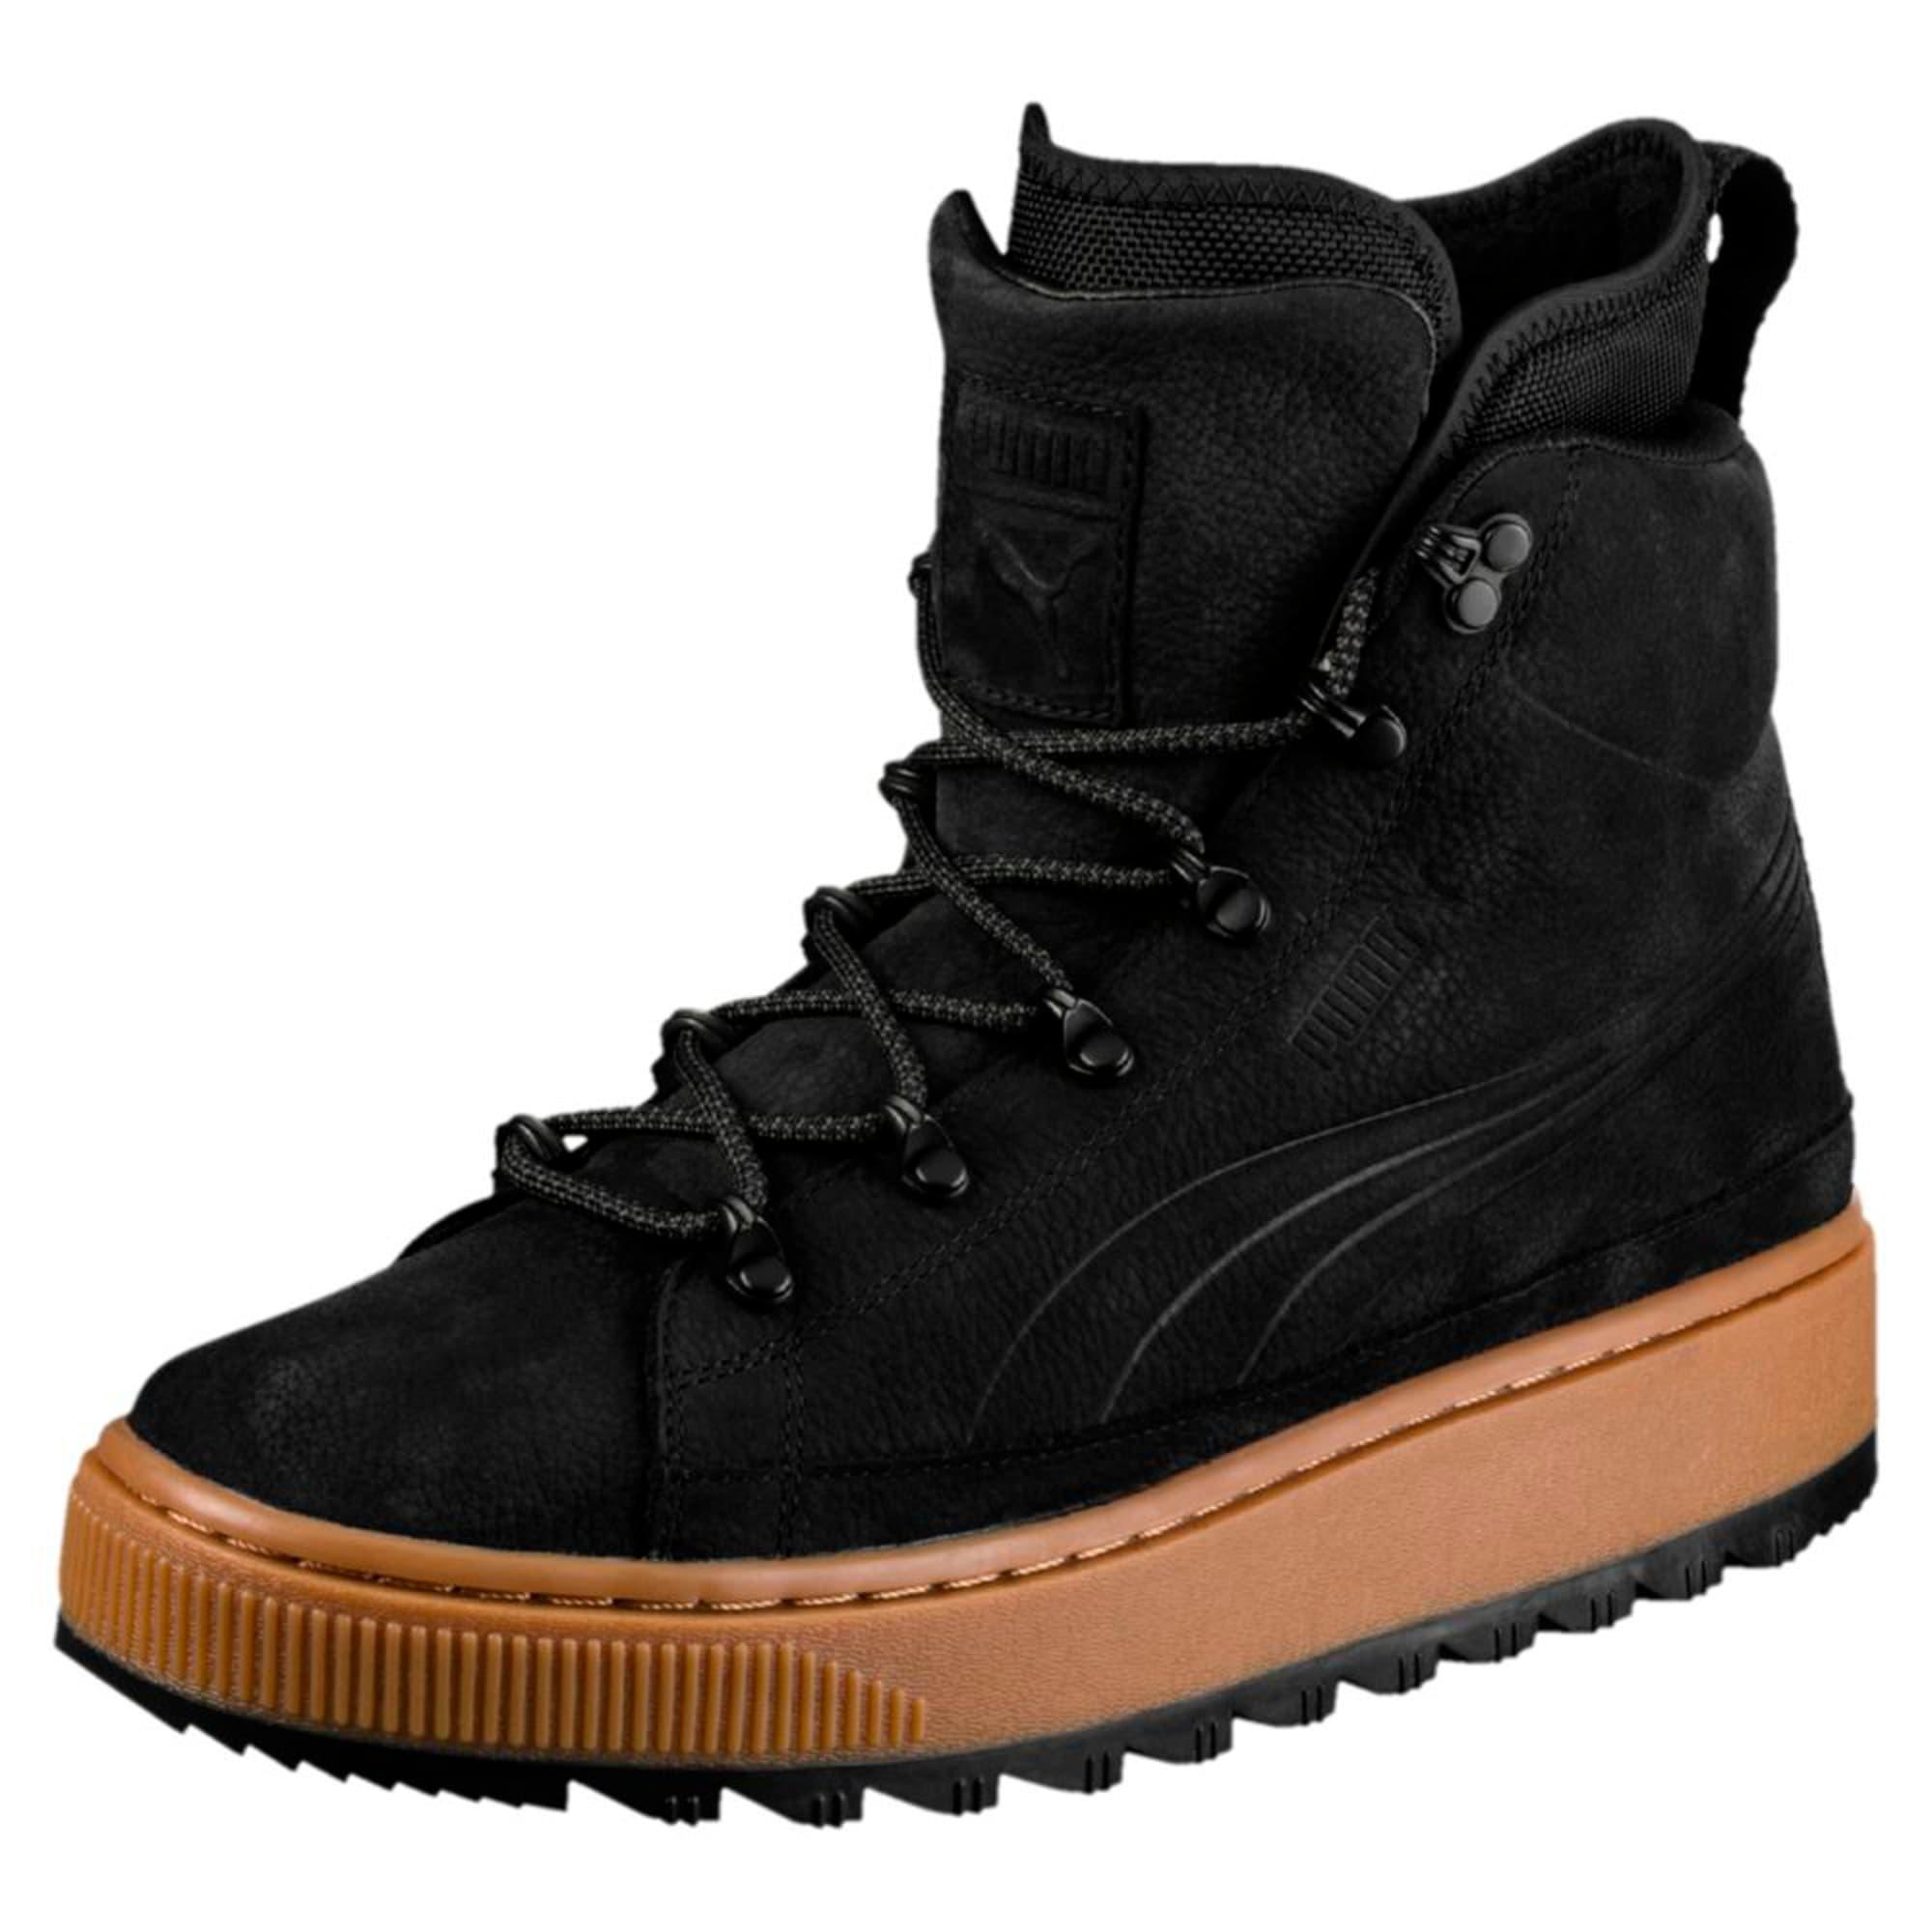 Thumbnail 1 of The Ren Boots, Puma Black, medium-IND